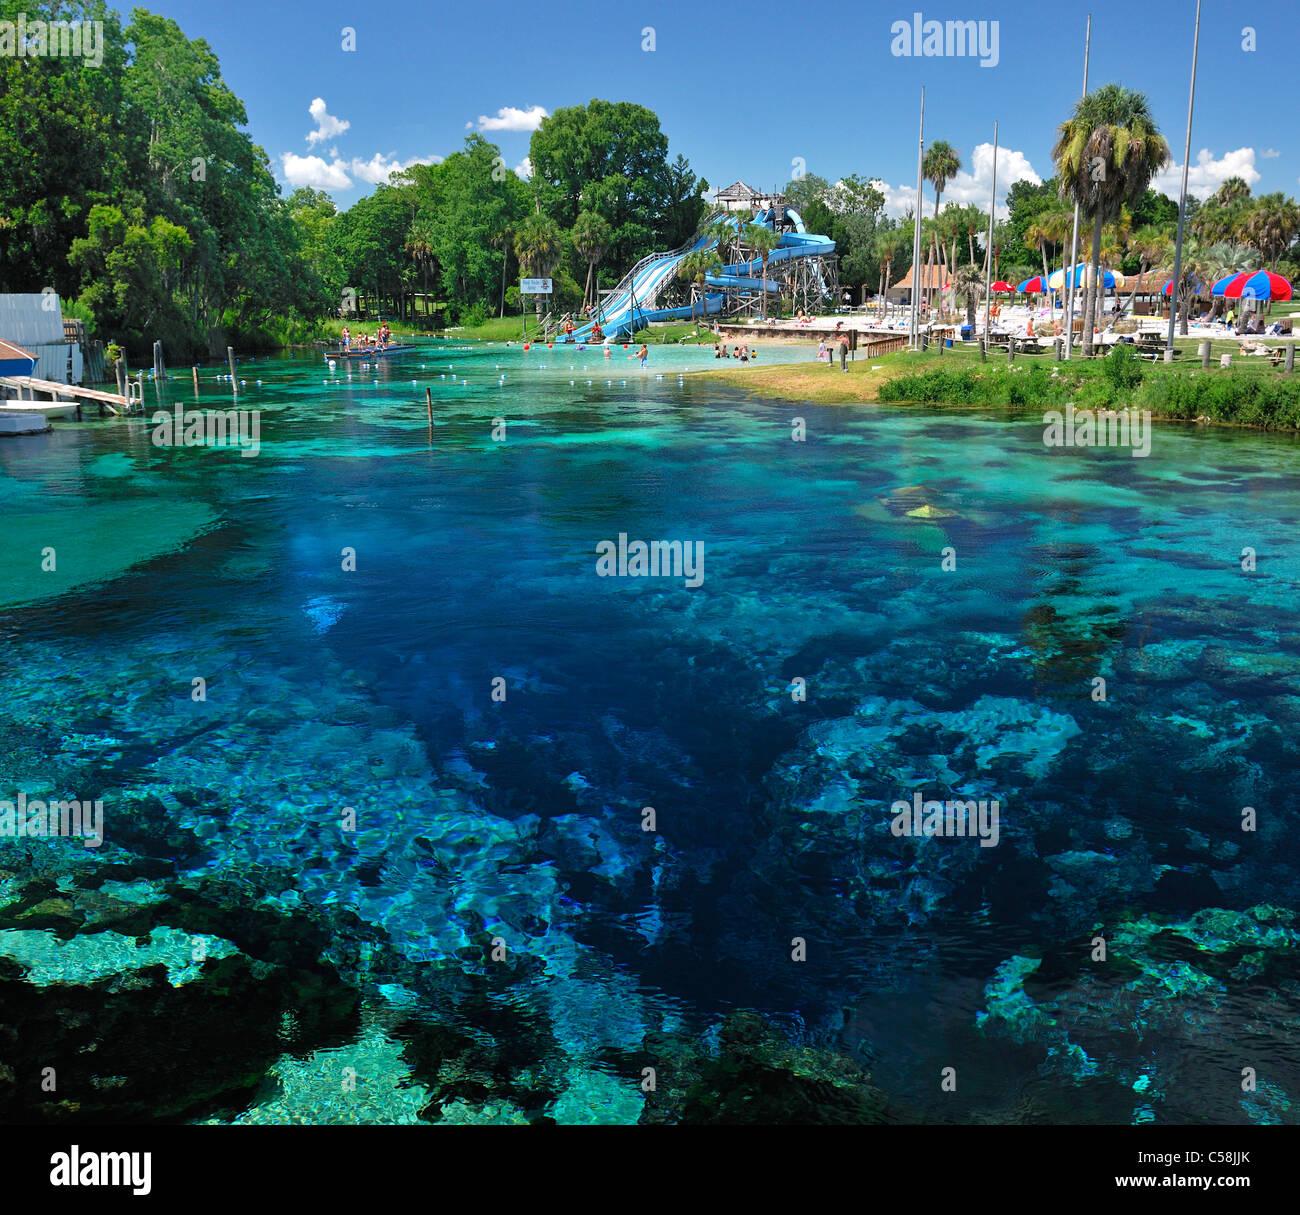 Weeki Wachee, Spring, Water park, Weeki Wachee Springs, State Park, water, Florida, USA, United States, America, - Stock Image